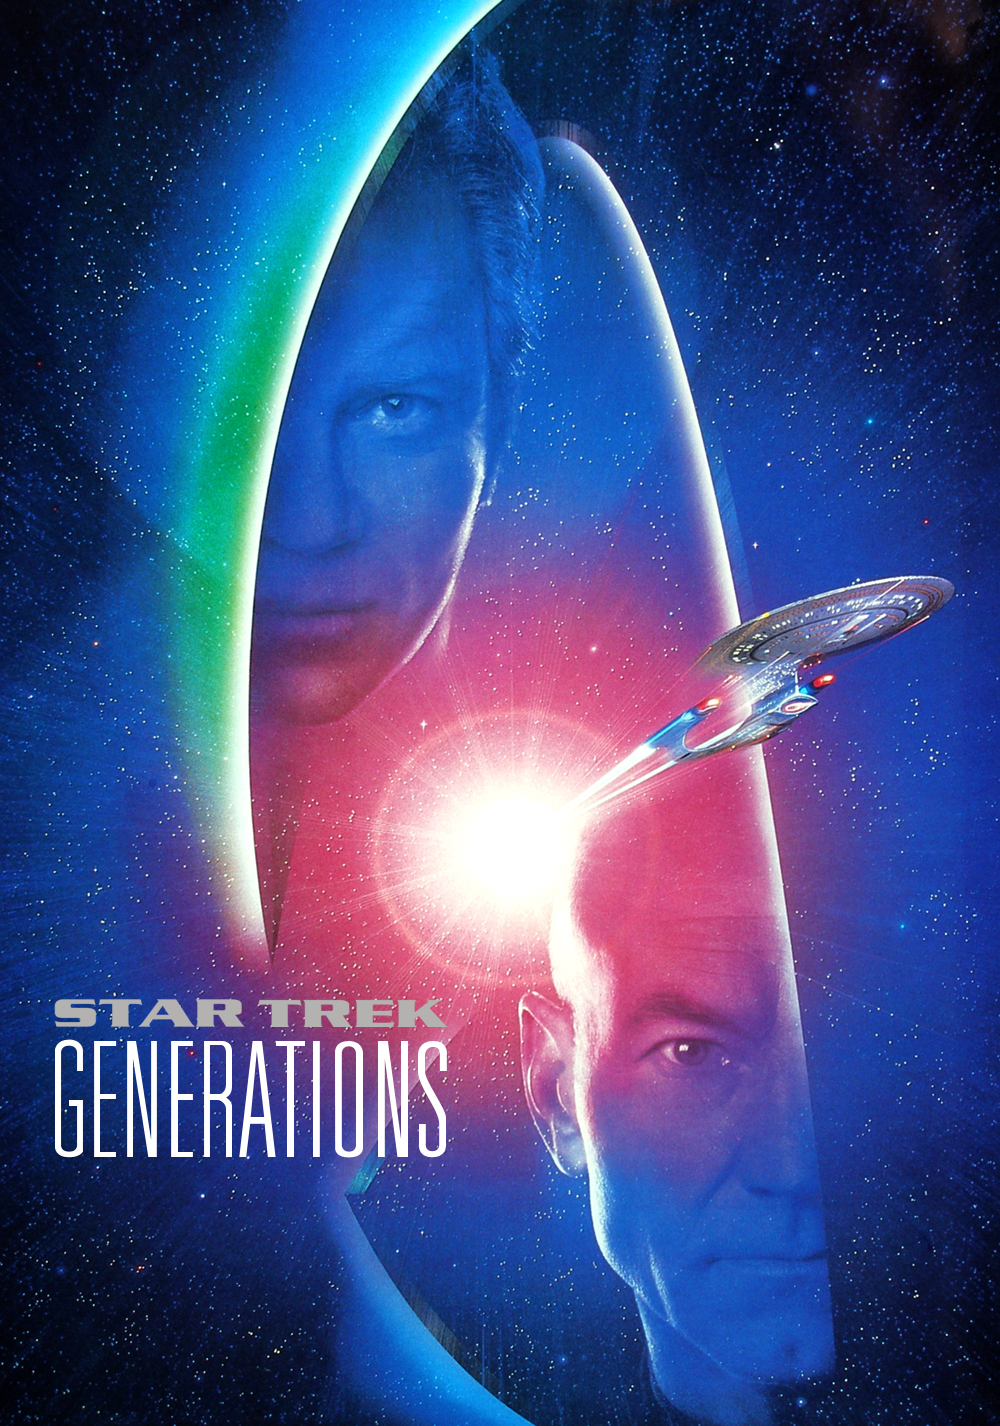 Star Trek: Generations Star_Trek_Generations_poster